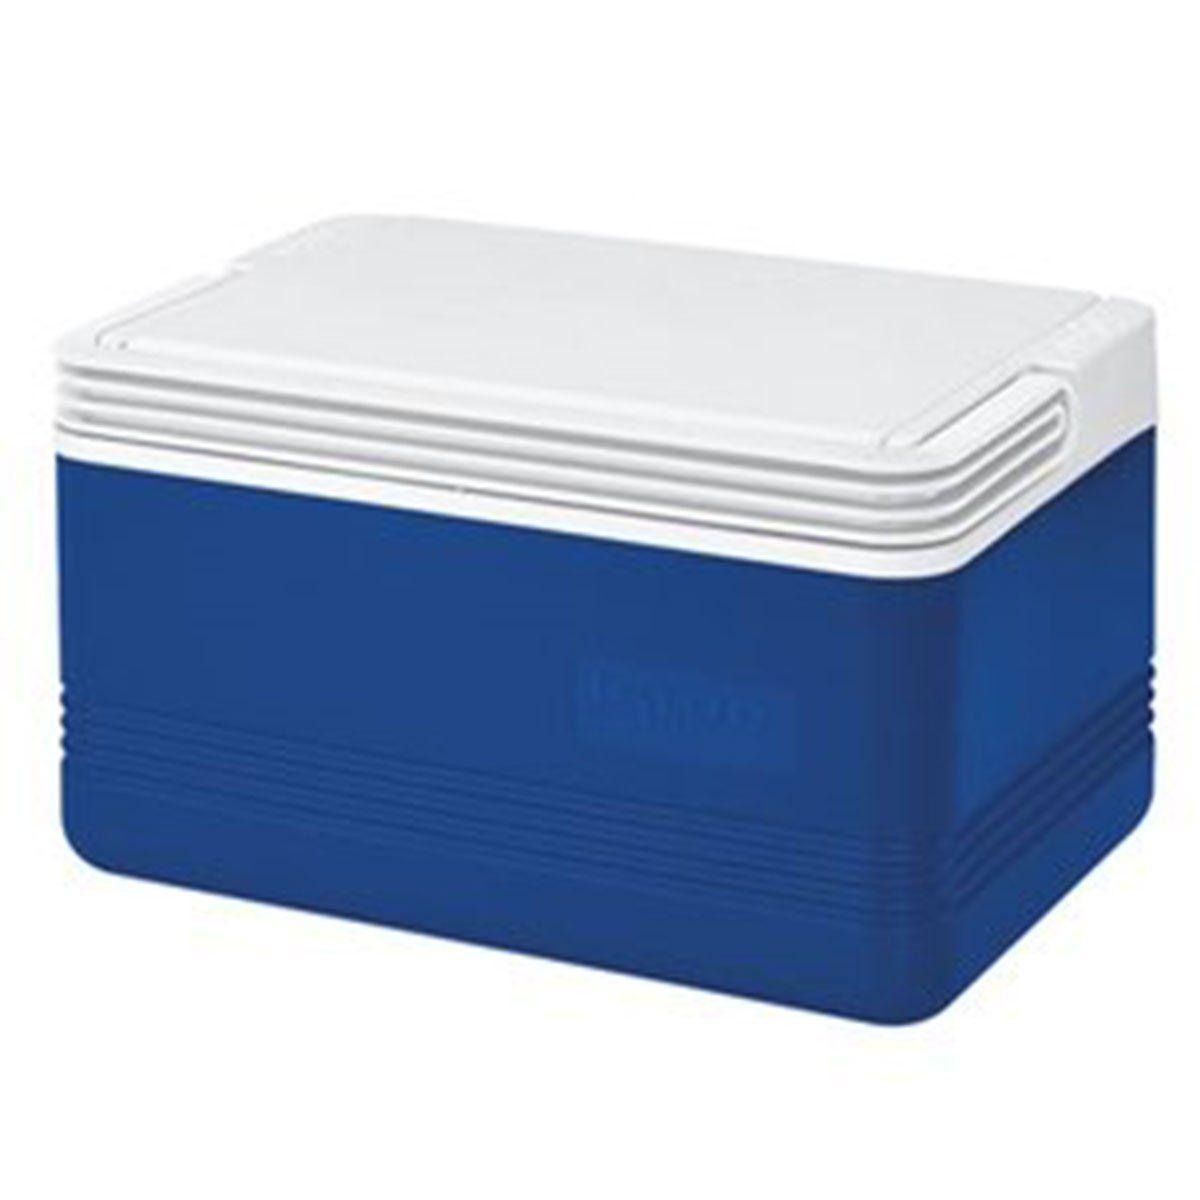 Caixa Térmica Nautika 4 Litros Legend 6 Azul